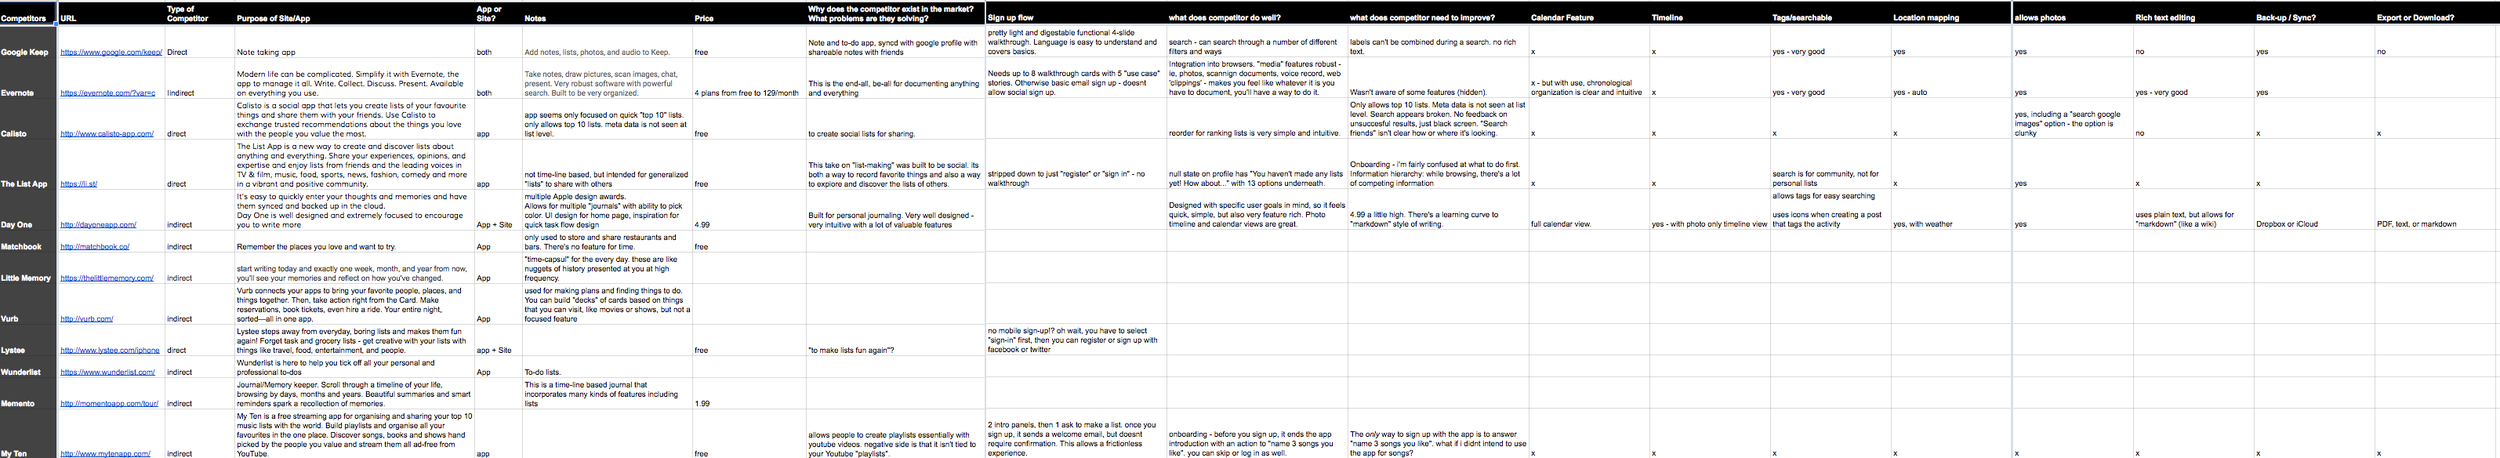 Birds-eye view of the spreadsheet.